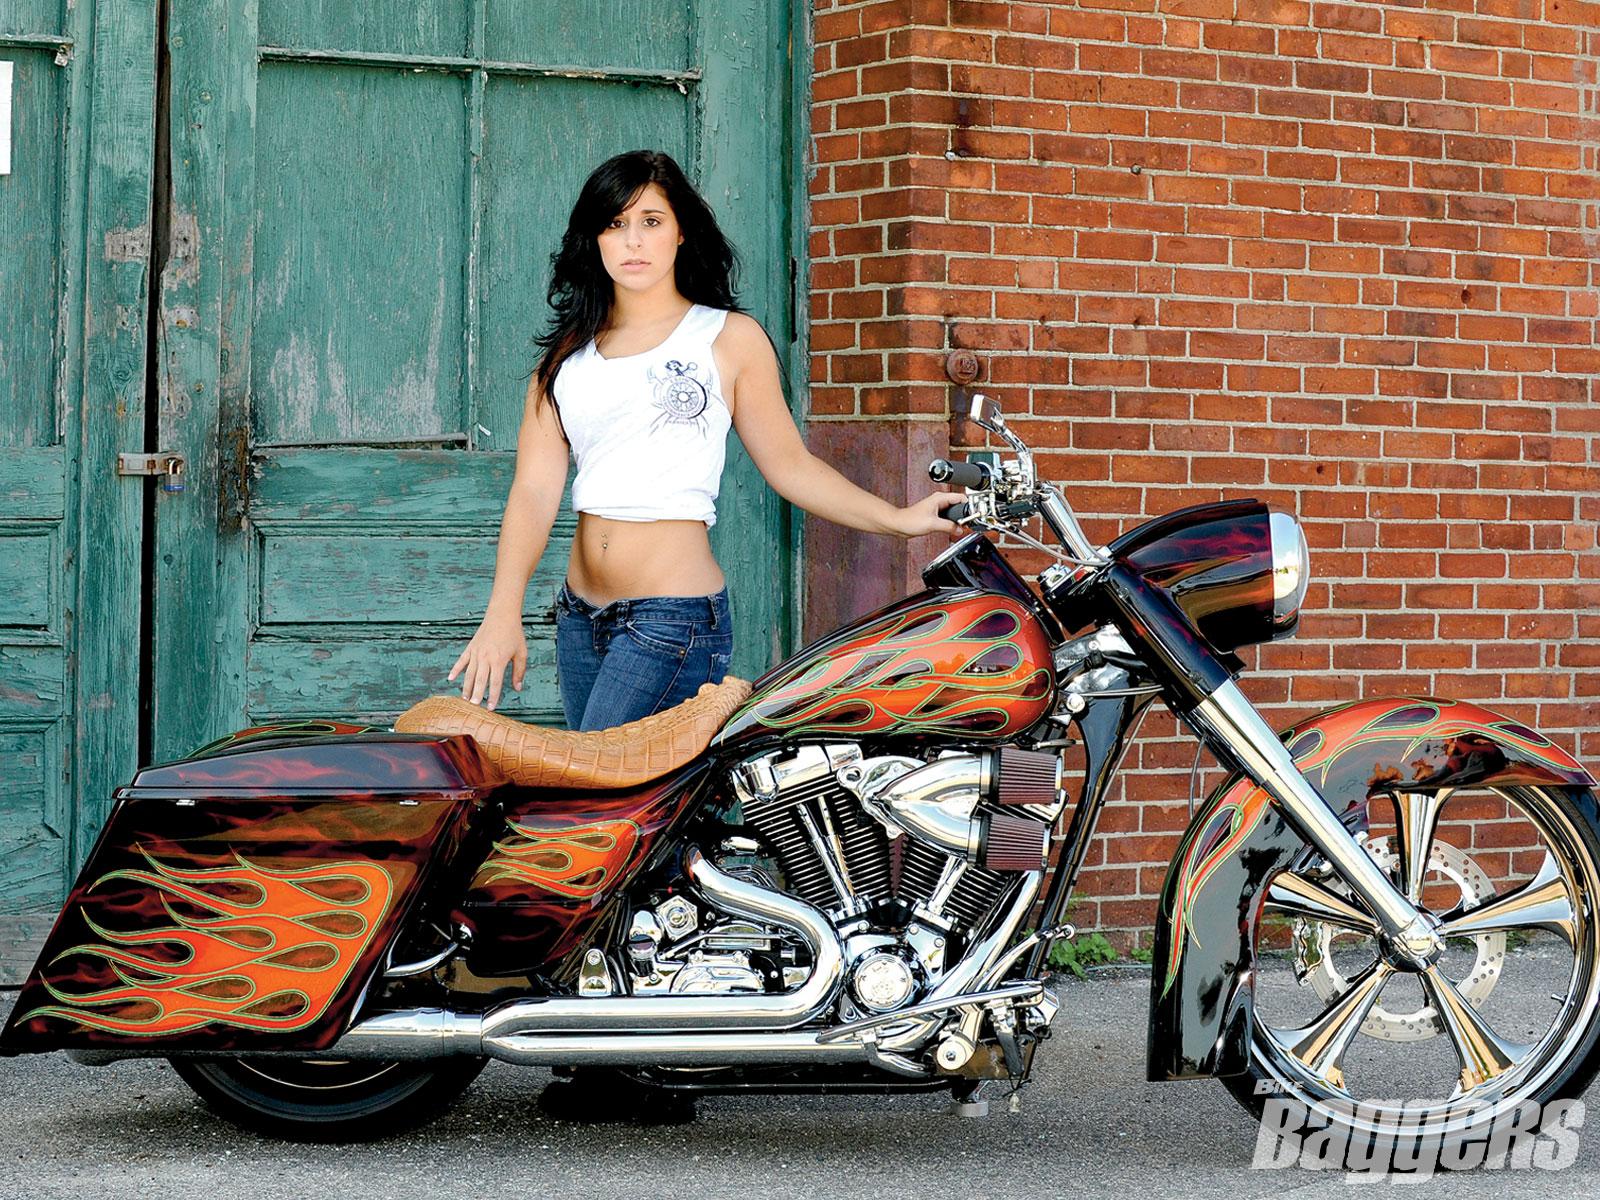 Girls And Motorcycles 1dbaf531jpg